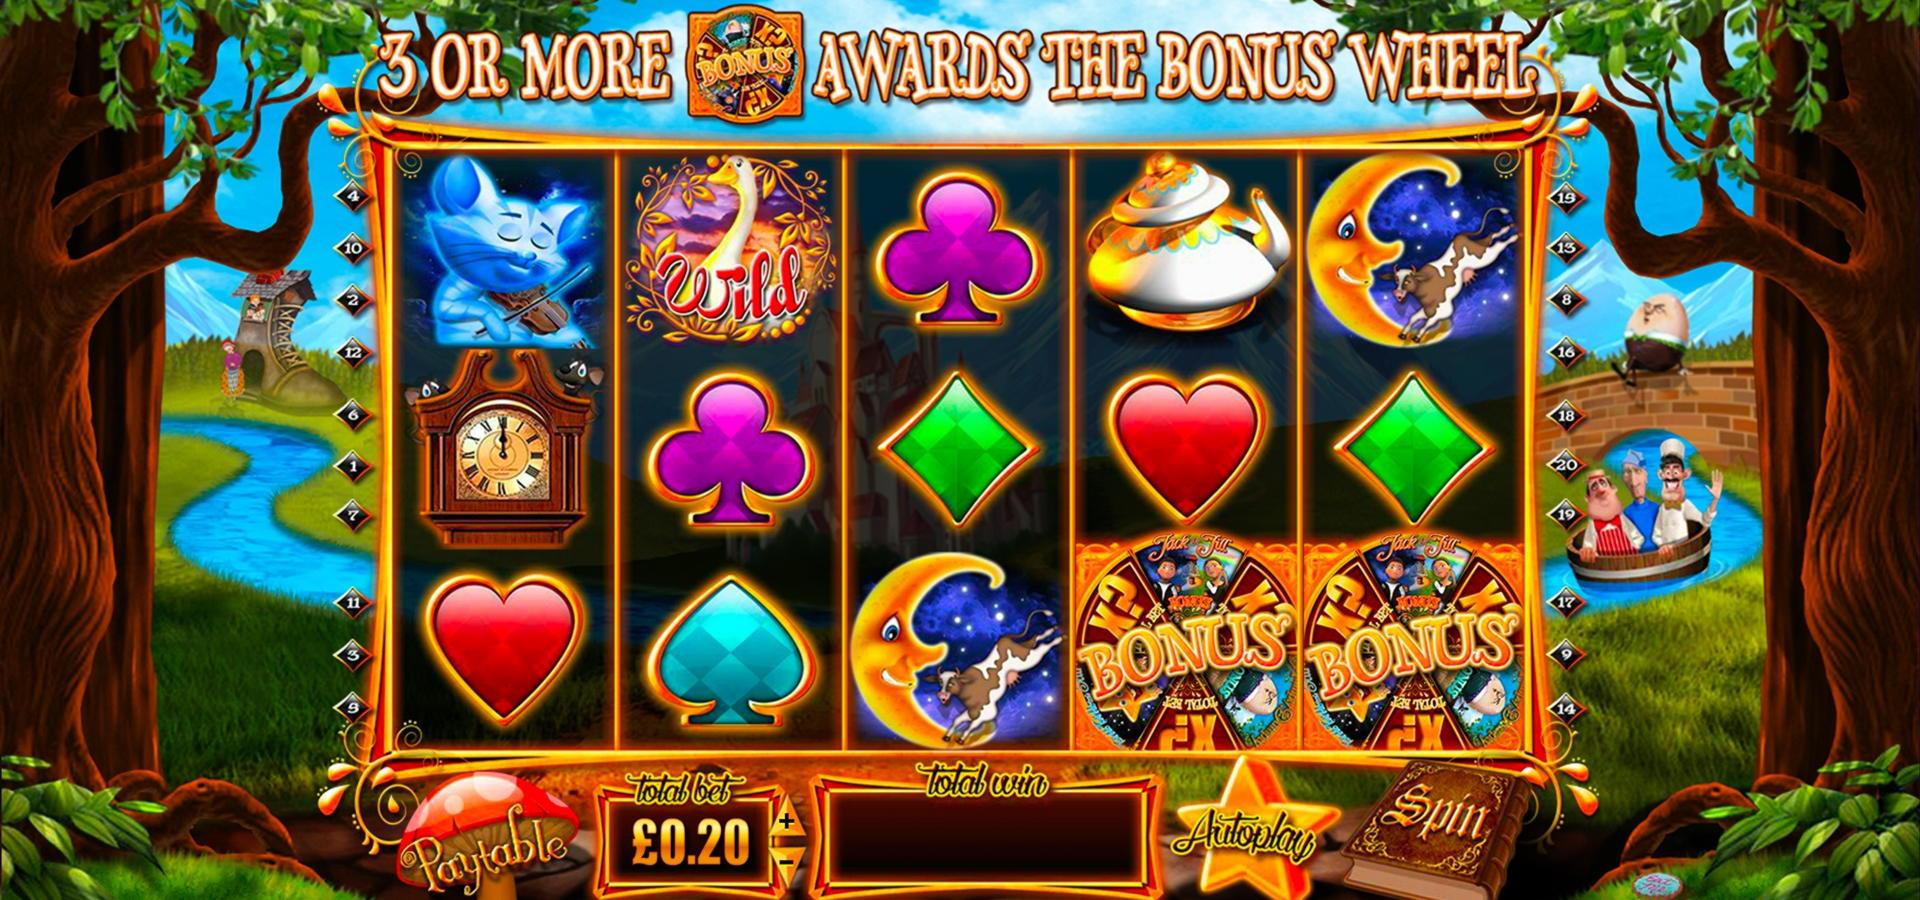 225% Casino match bonus at LV Bet